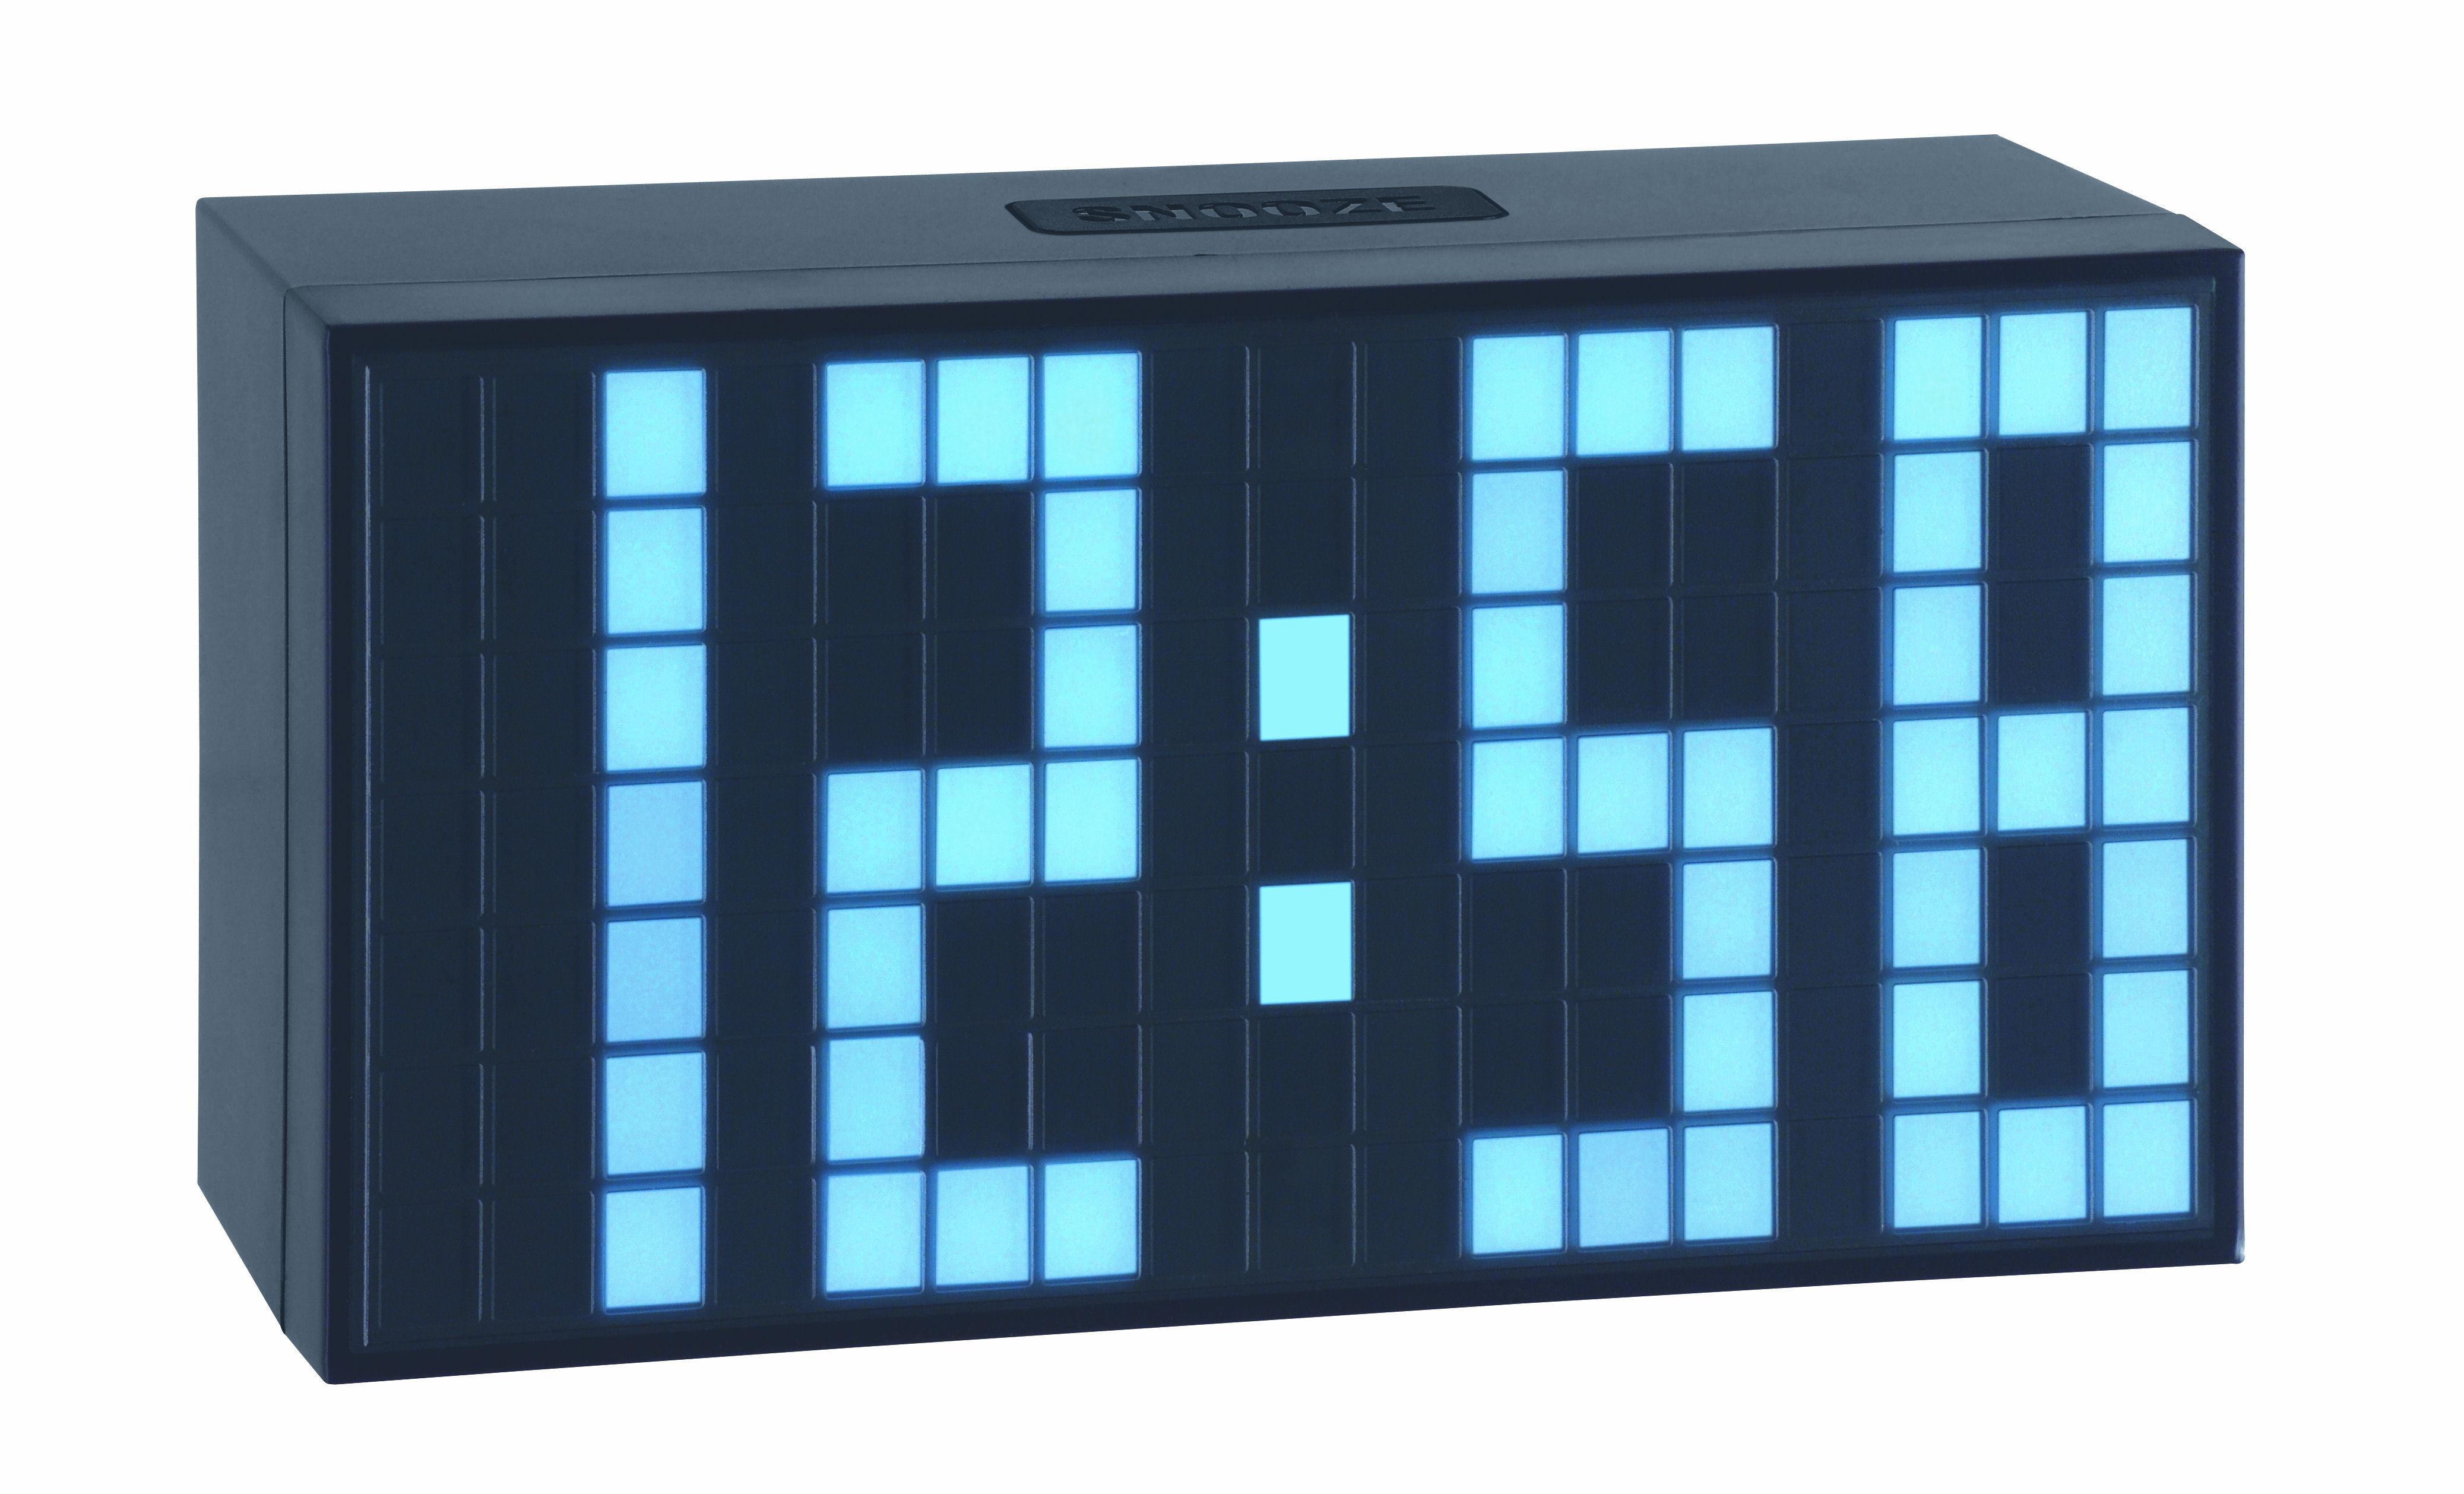 tfa dostmann time block elektronischer wecker. Black Bedroom Furniture Sets. Home Design Ideas